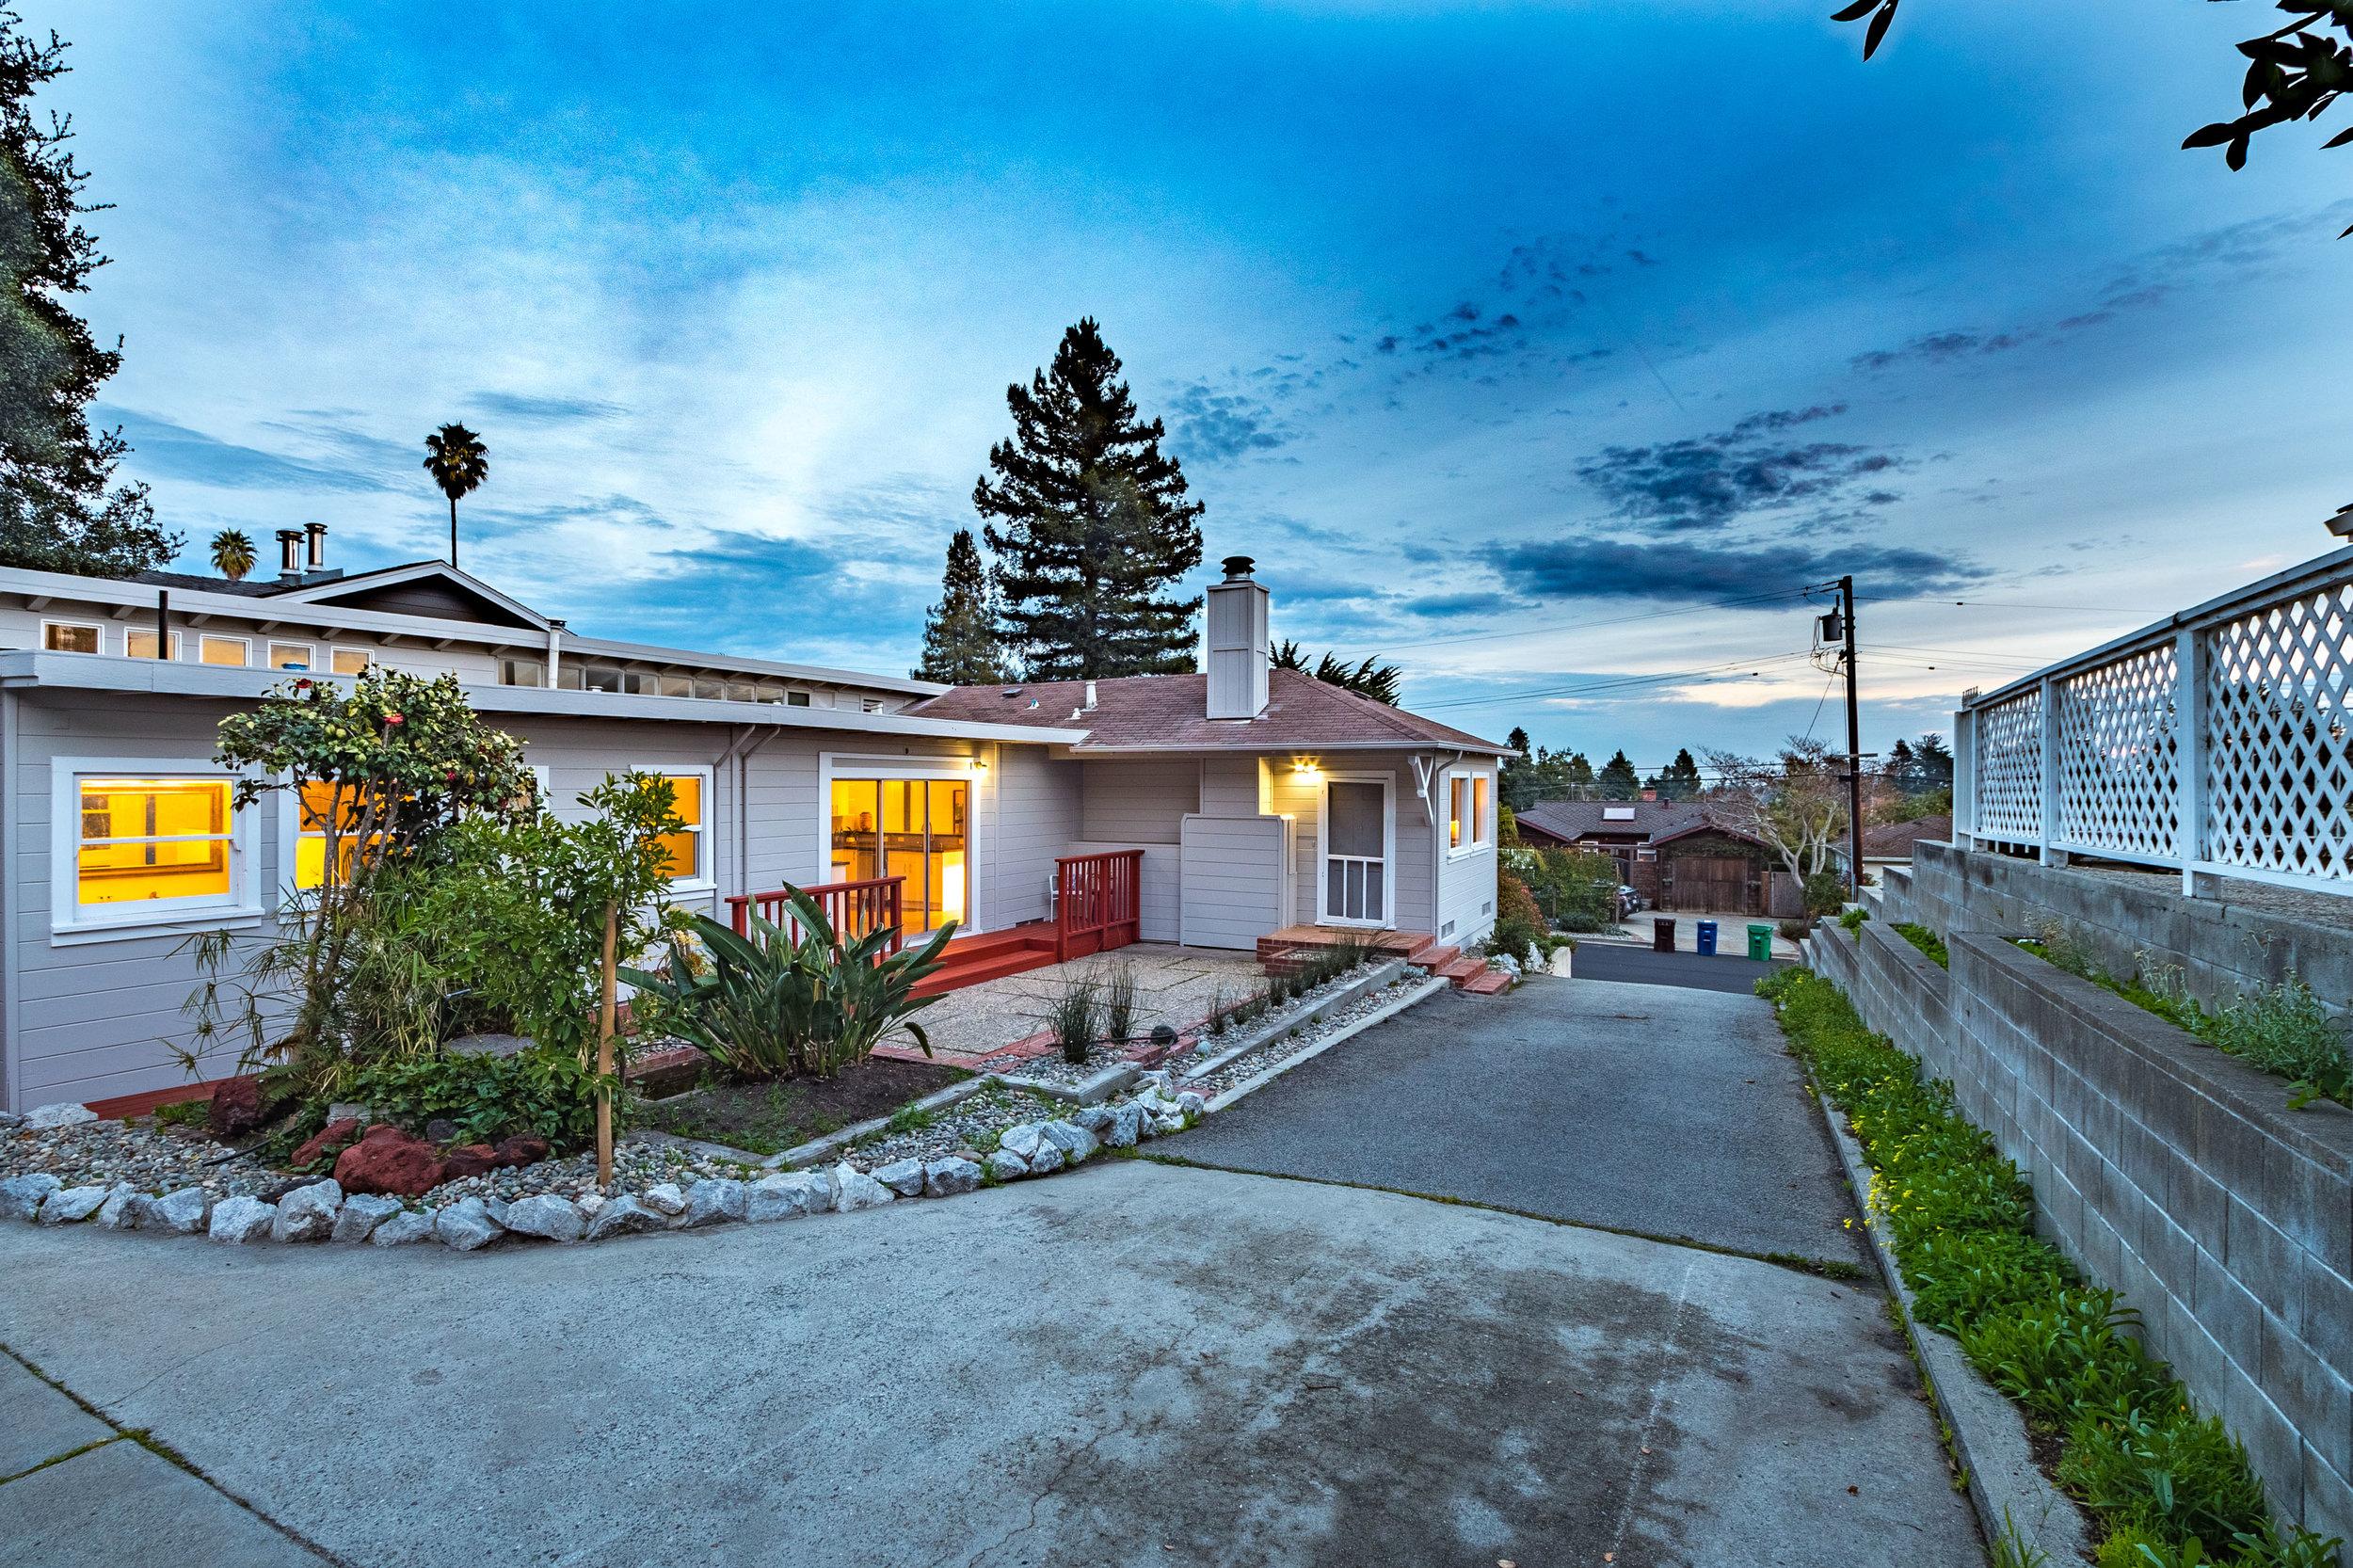 Upper Westside Property in Santa Cruz, California